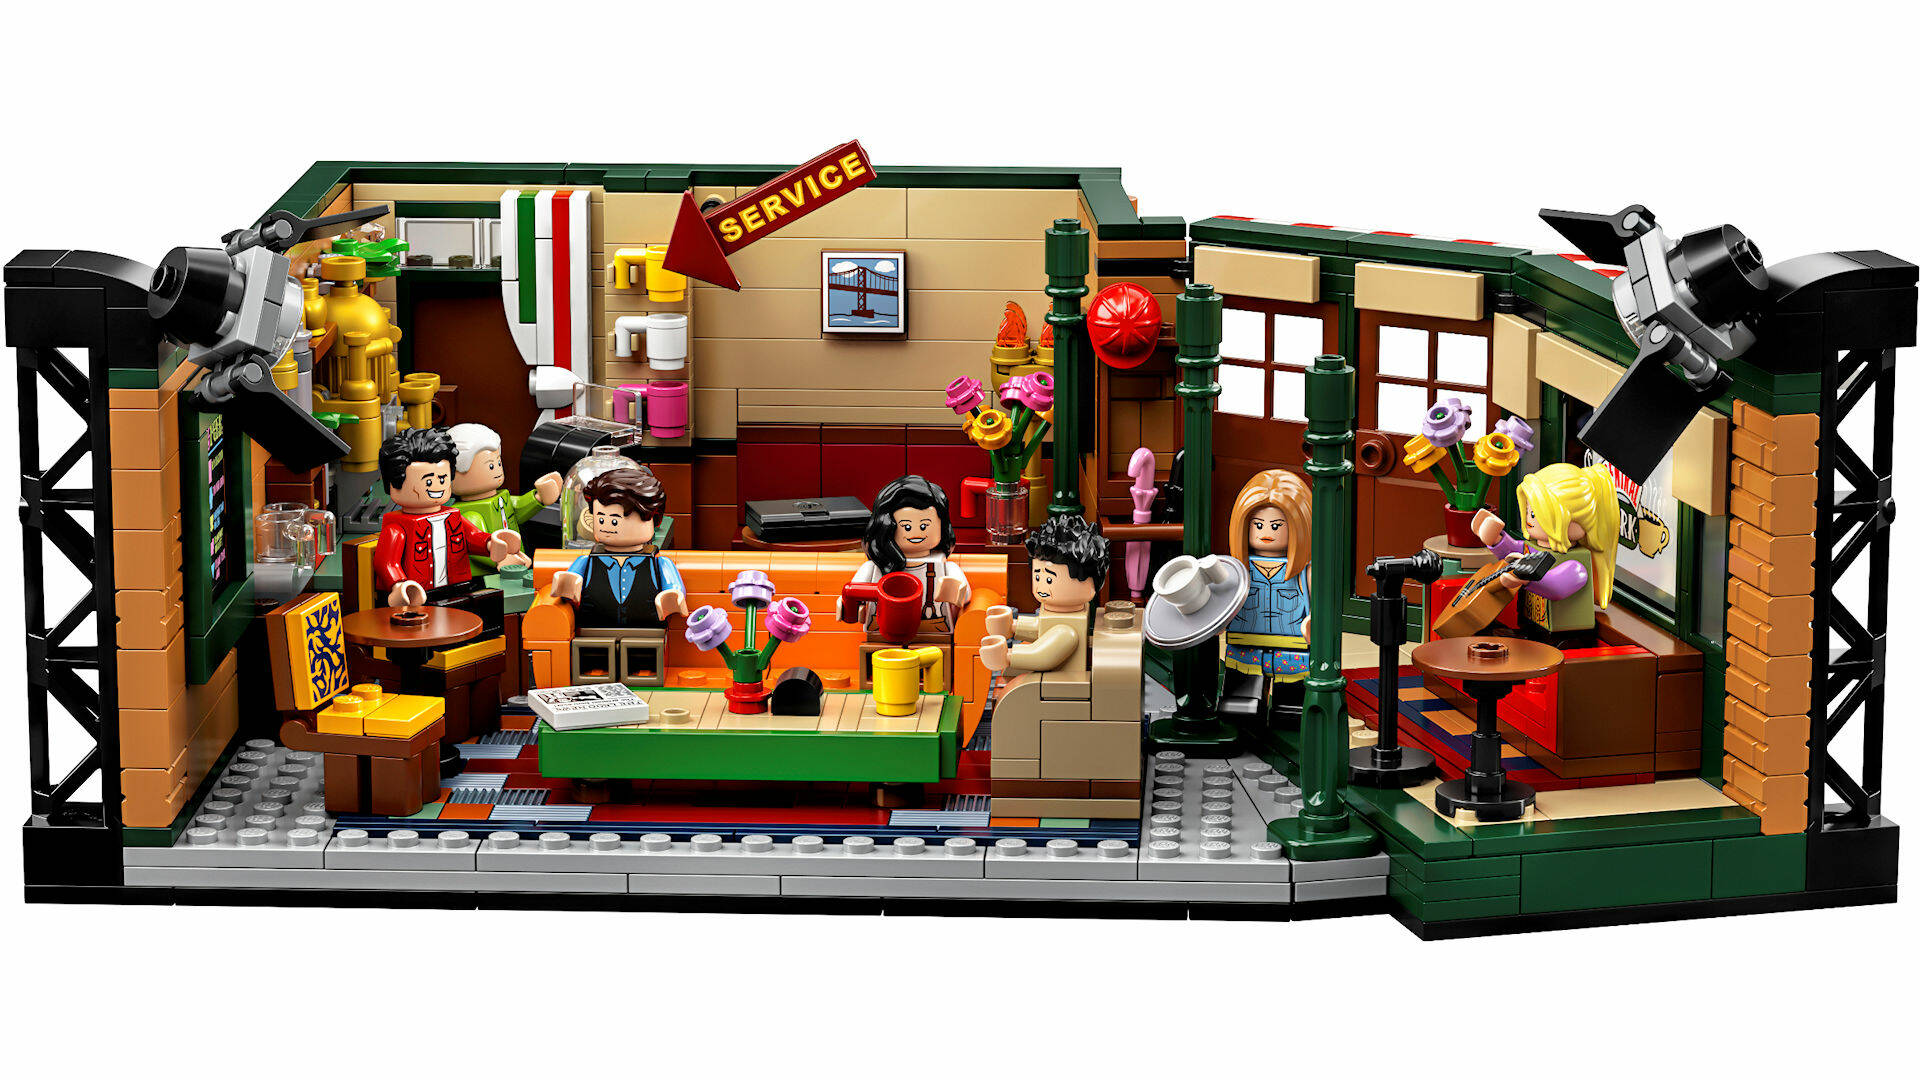 LEGO IDEAS #21328 SEINFELD